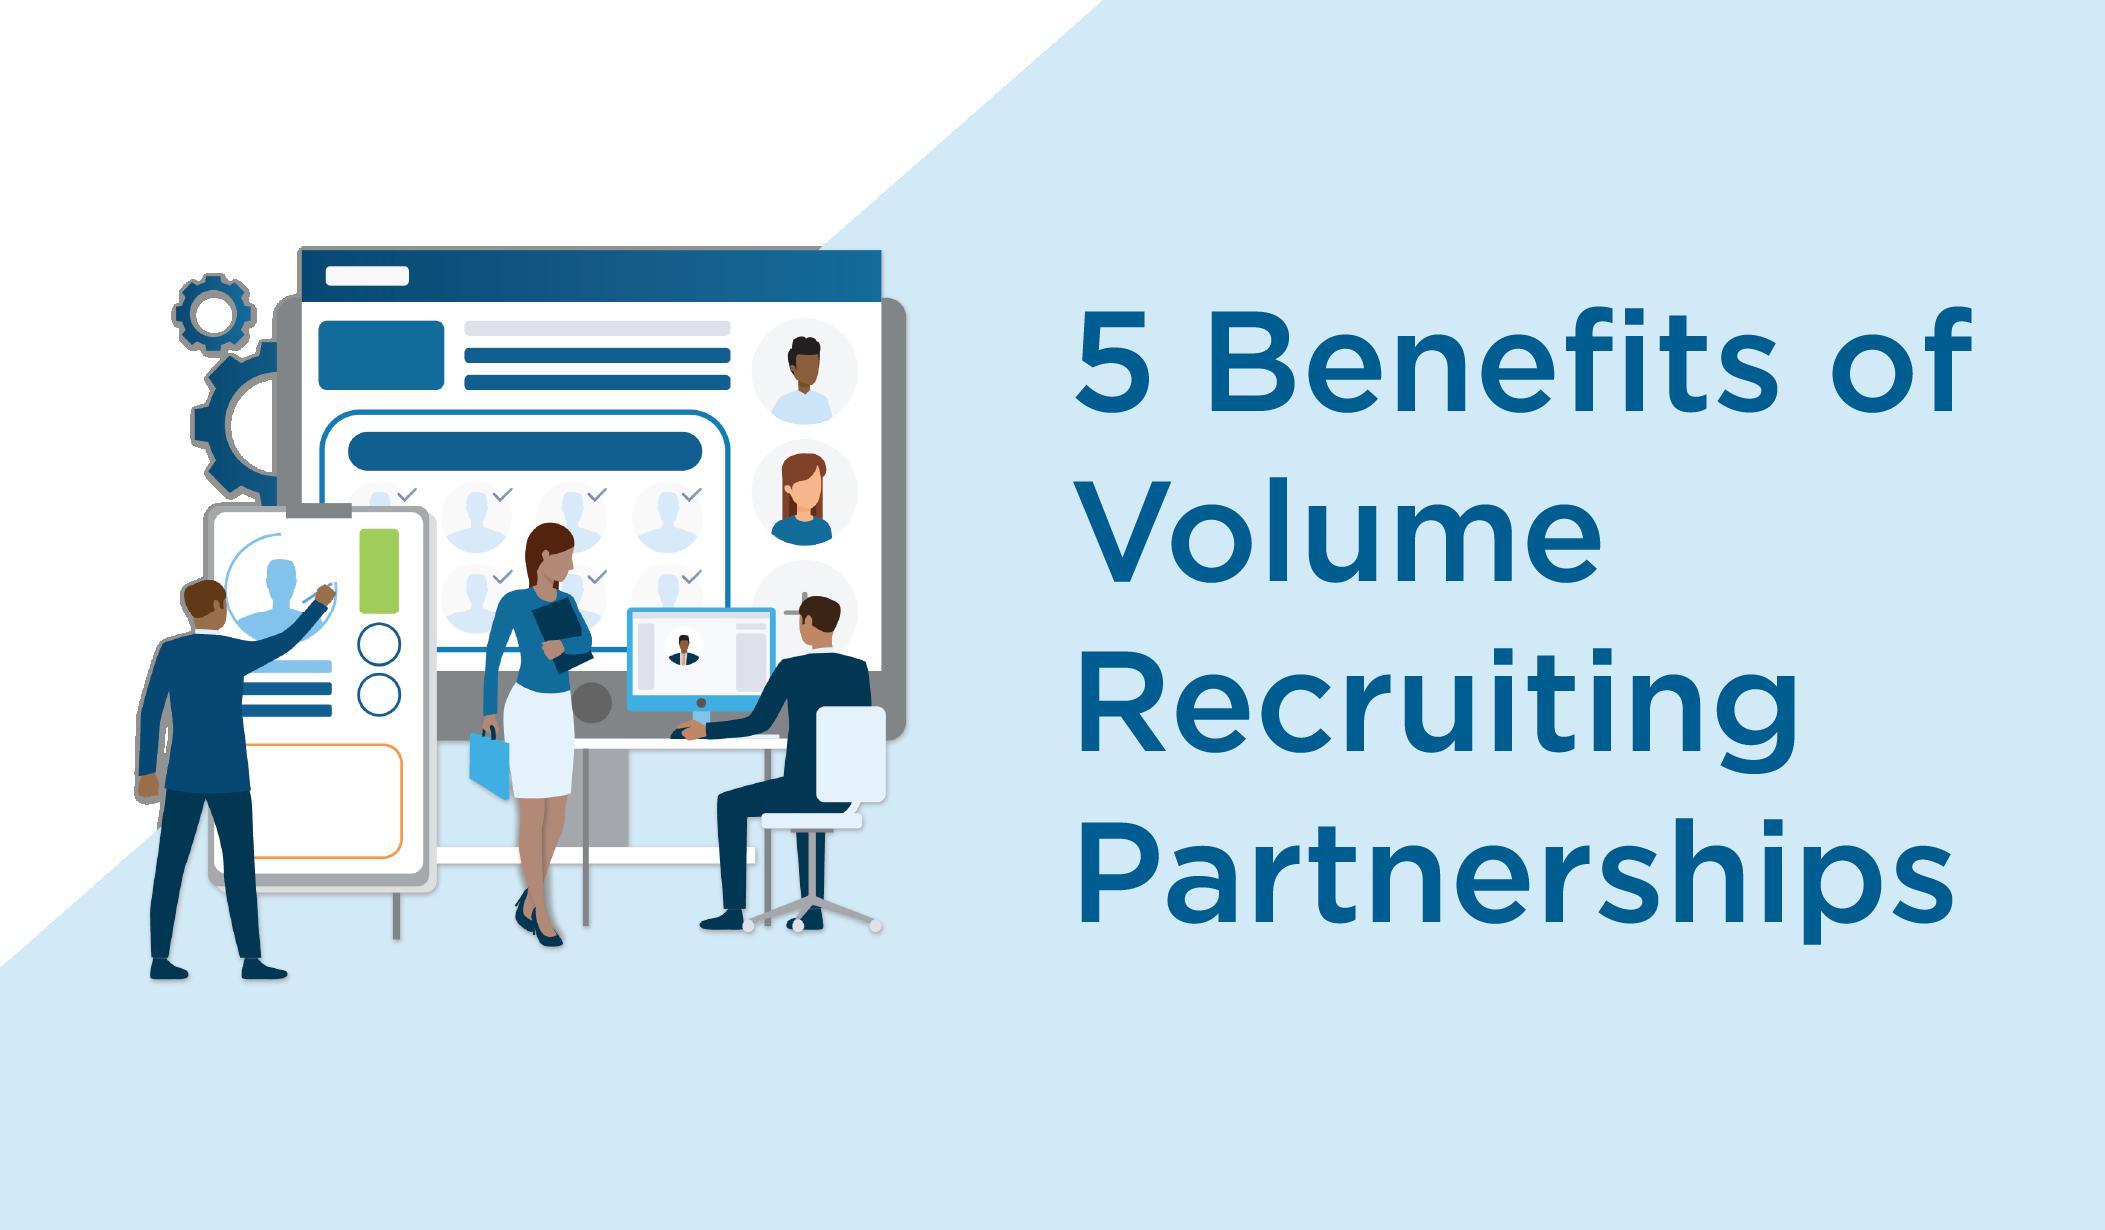 5 Benefits of Volume Recruiting Partnerships